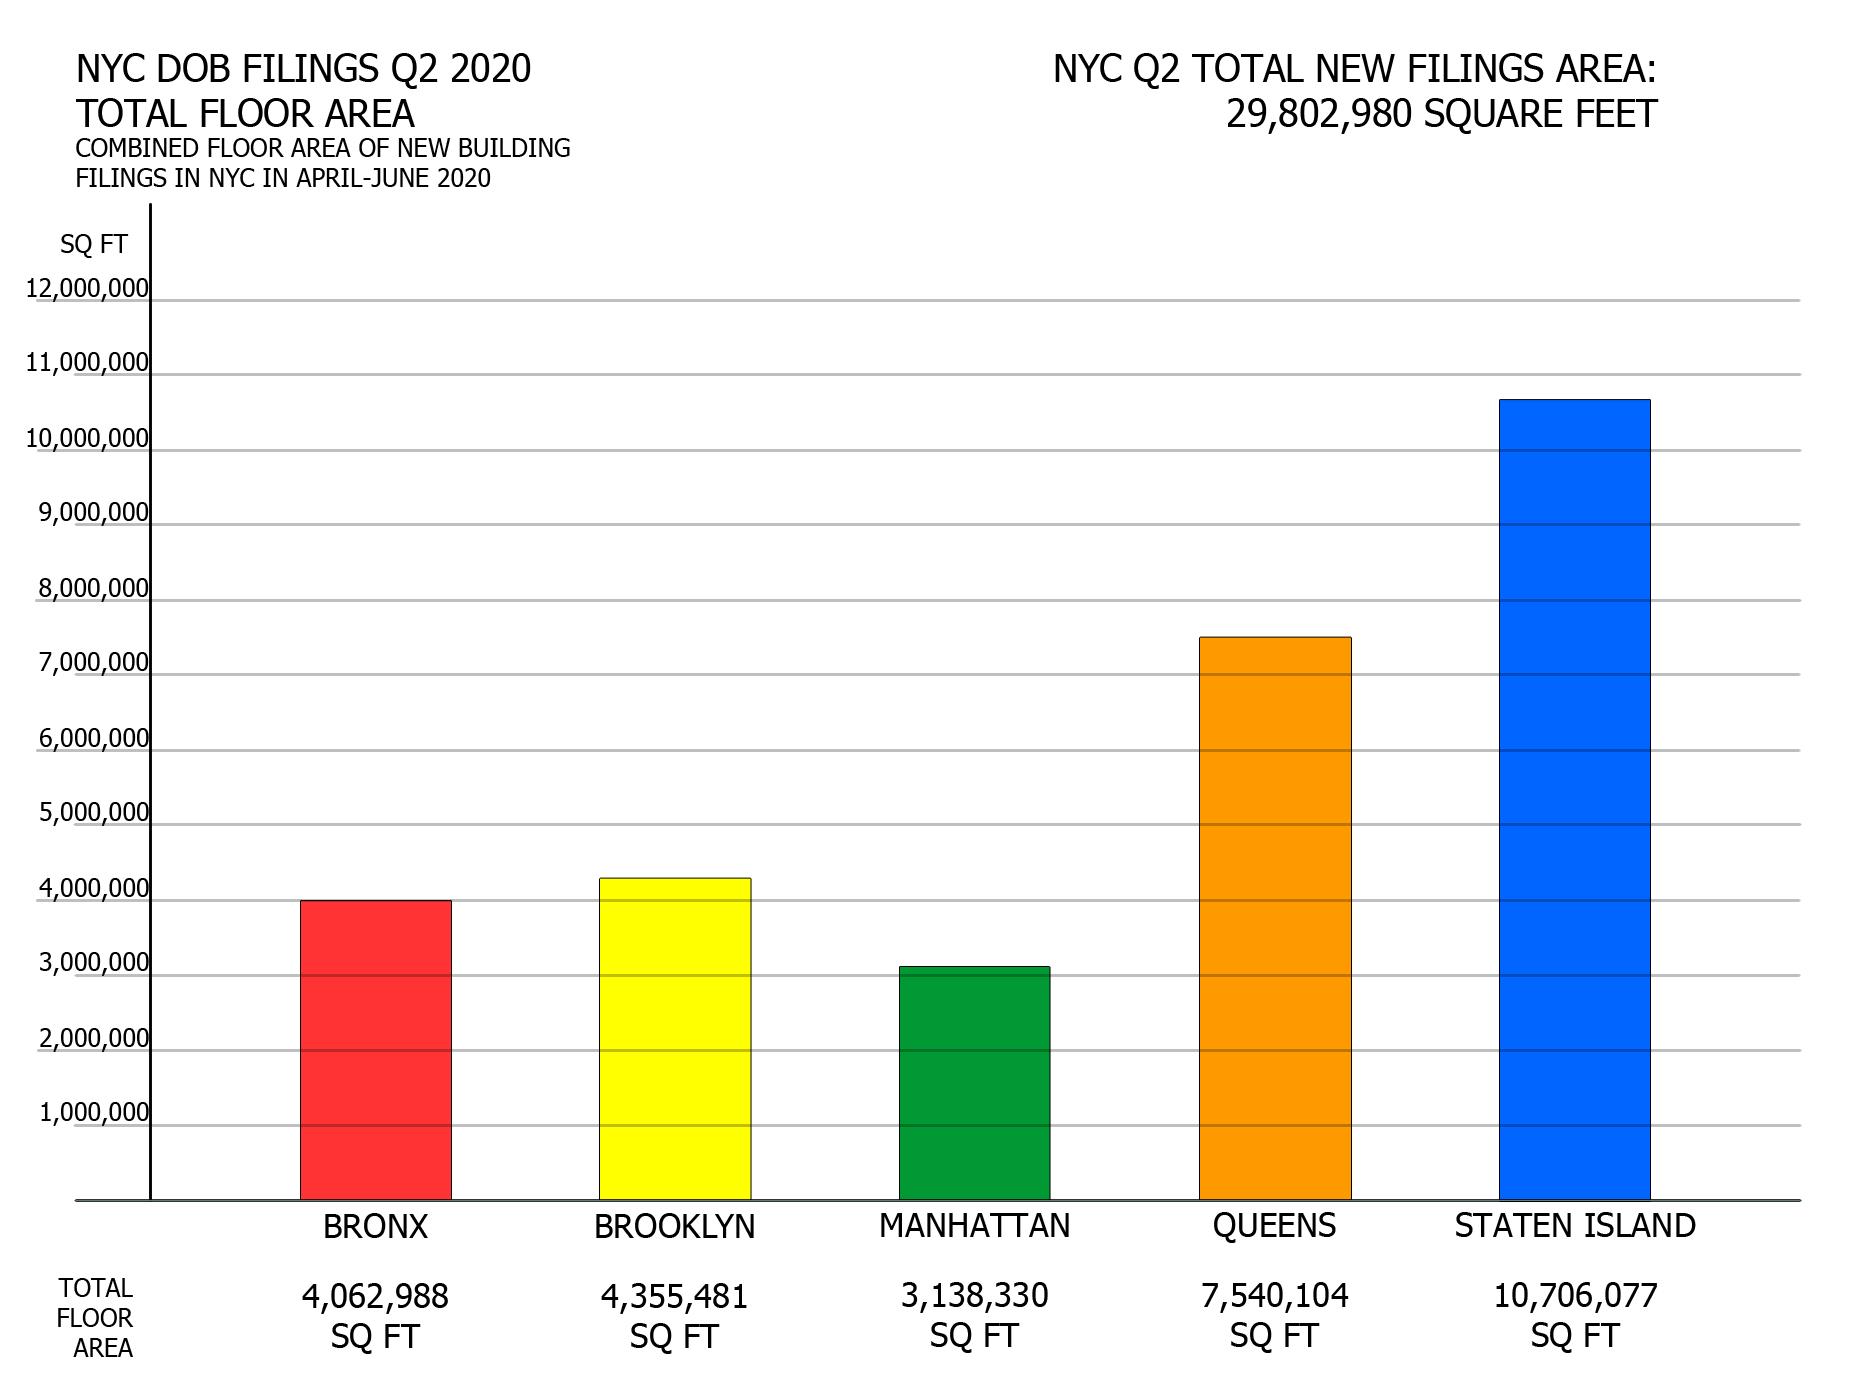 NYC Q2 2020 filings - Total proposed floor area per borough. Image credit: Vitali Ogorodnikov